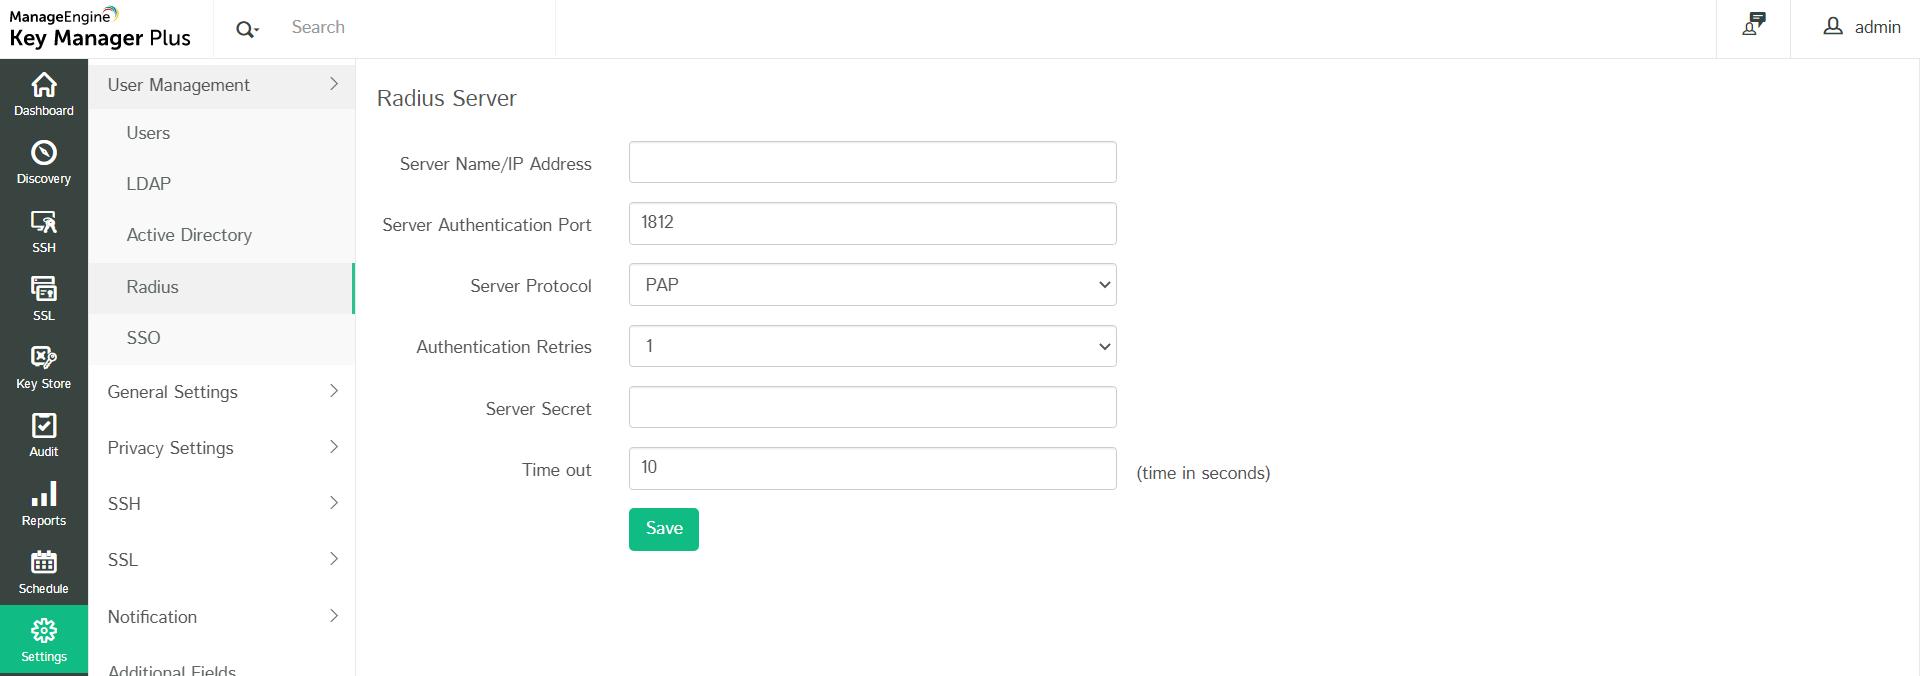 RADIUS authentication - Key Manager Plus